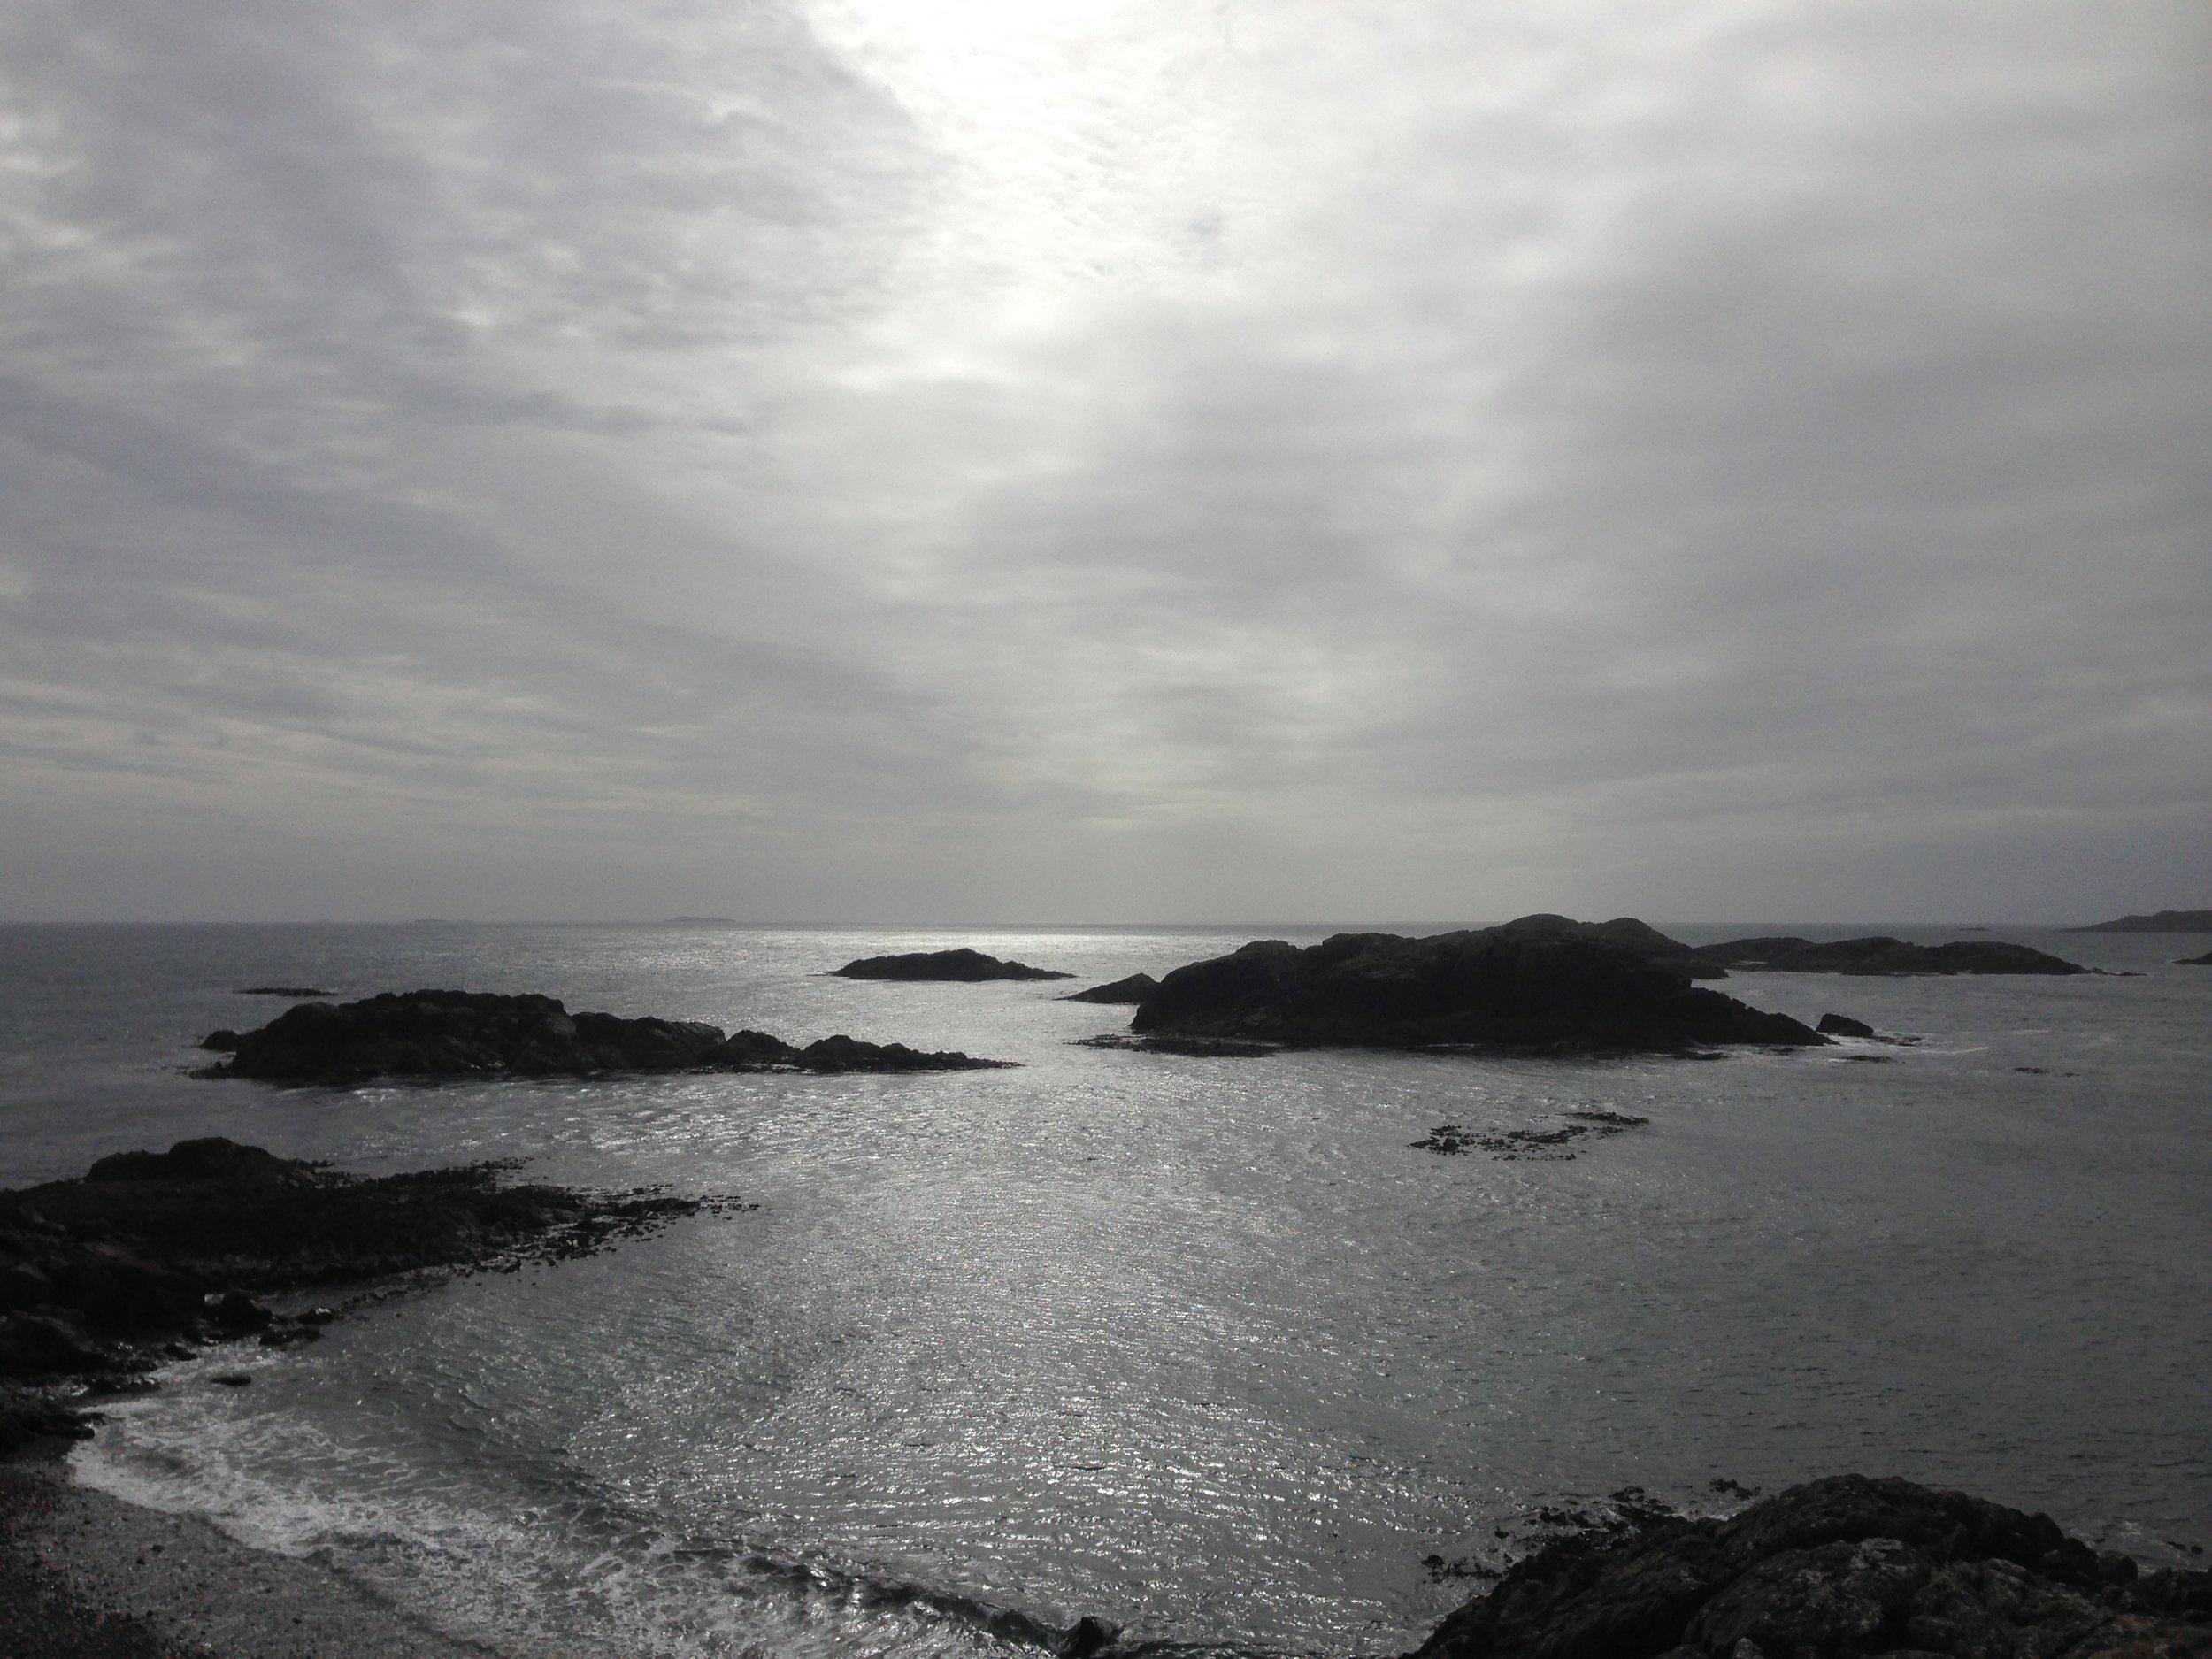 Sacred Island of Iona, Scotland